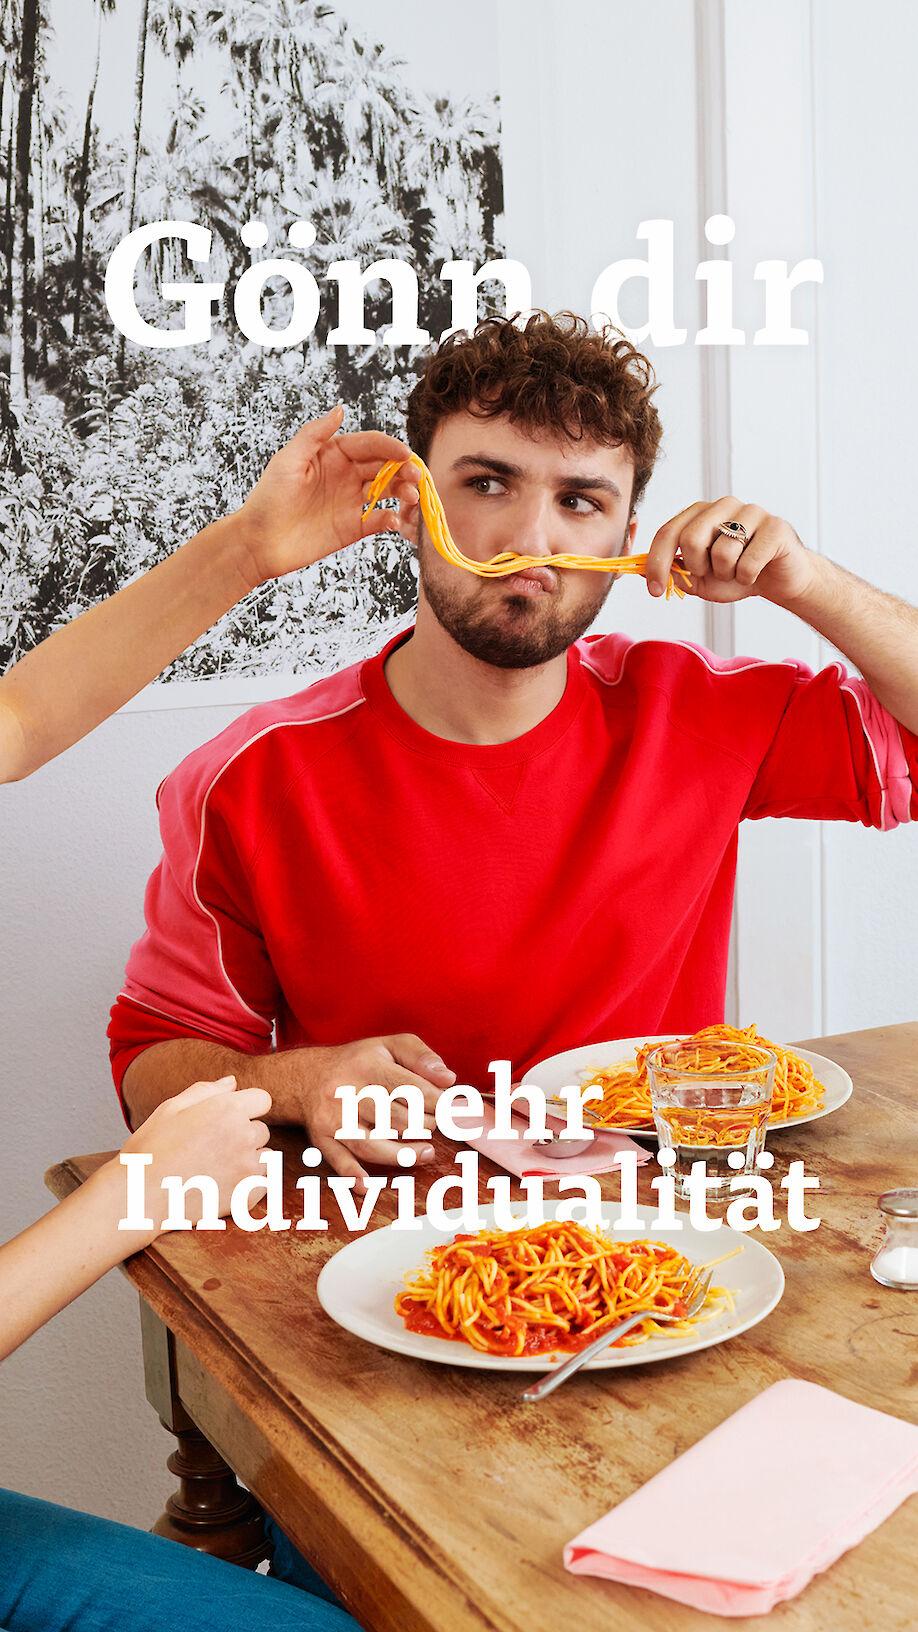 SABINA BÖSCH shoots a campaign for DIE MOBILIAR